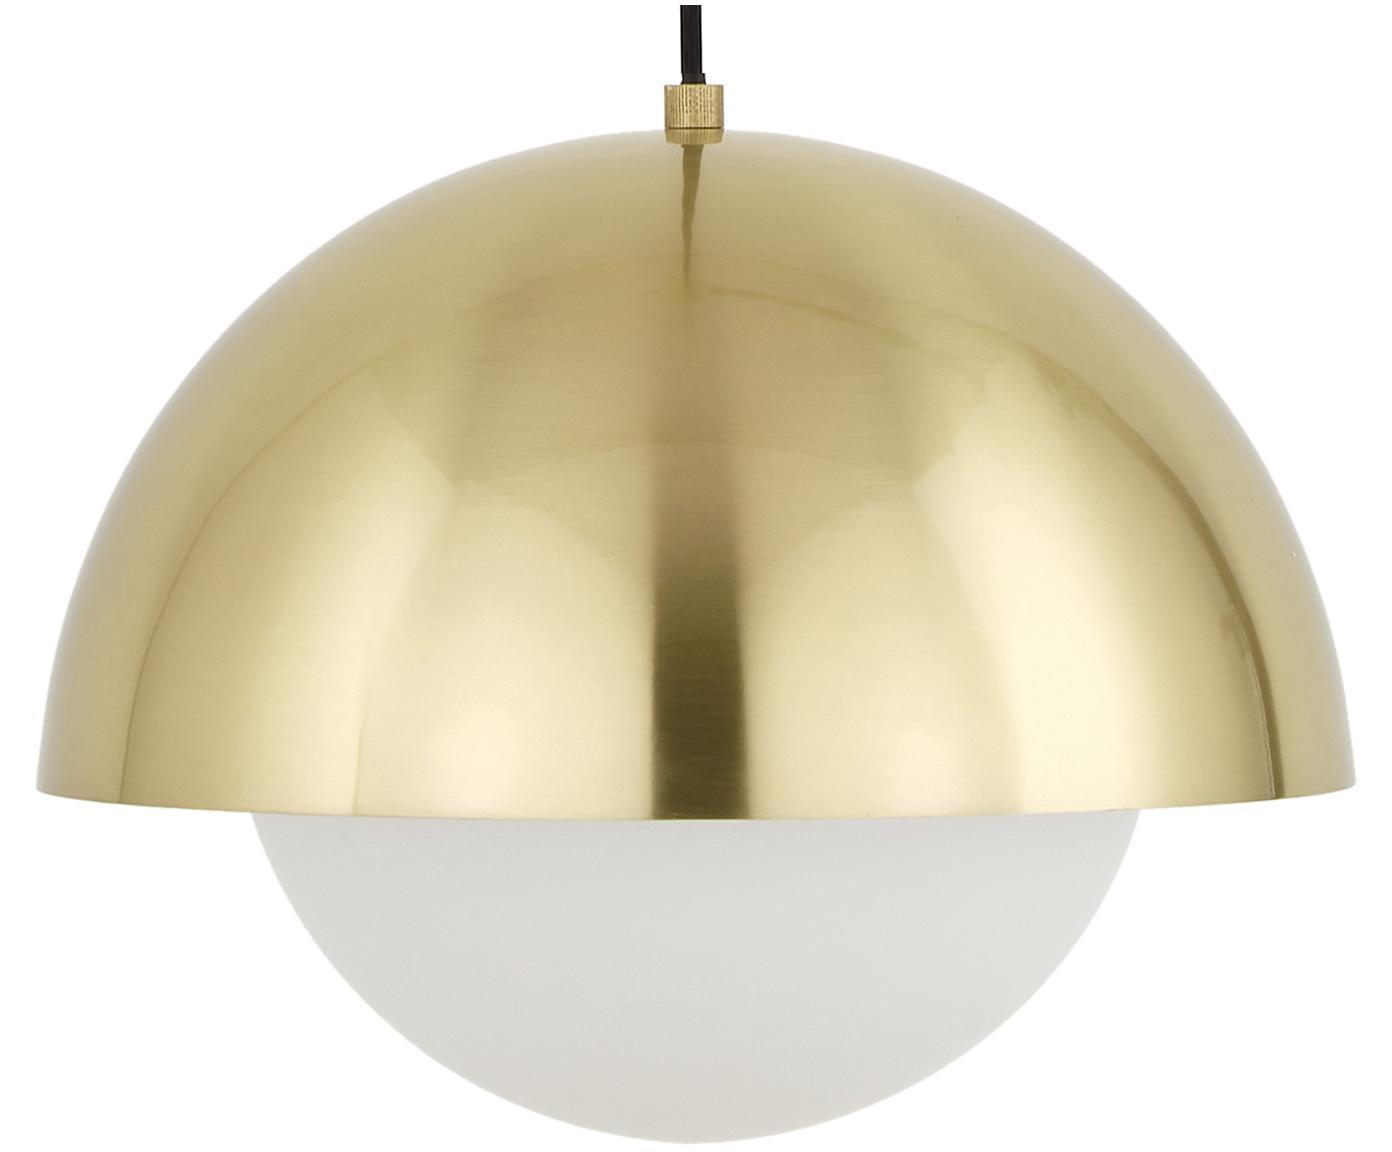 Pendelleuchte Lucille, Baldachin: Metall, gebürstet, Lampenschirm: Glas, Messing, Weiss, Ø 35 x H 30 cm